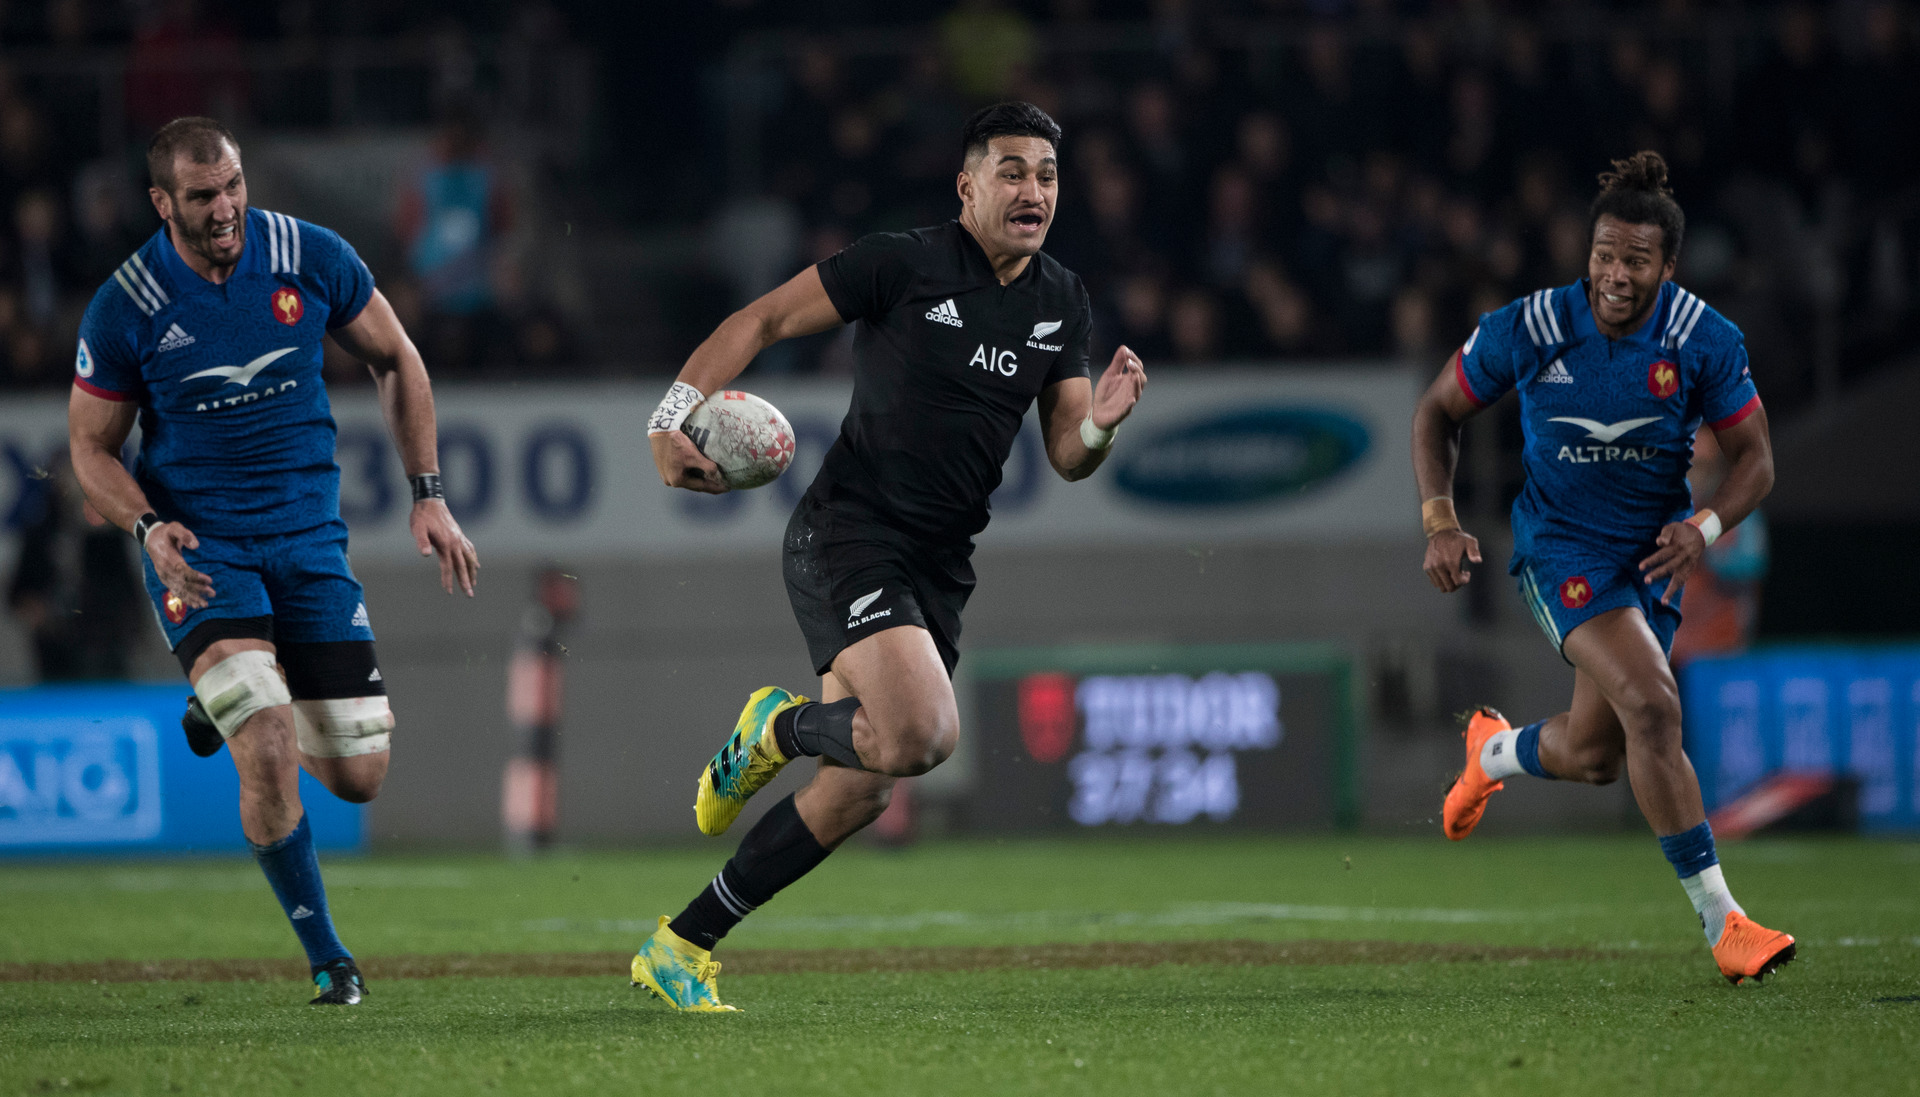 All Blacks: Rieko Ioane's big chance to get back up to speed